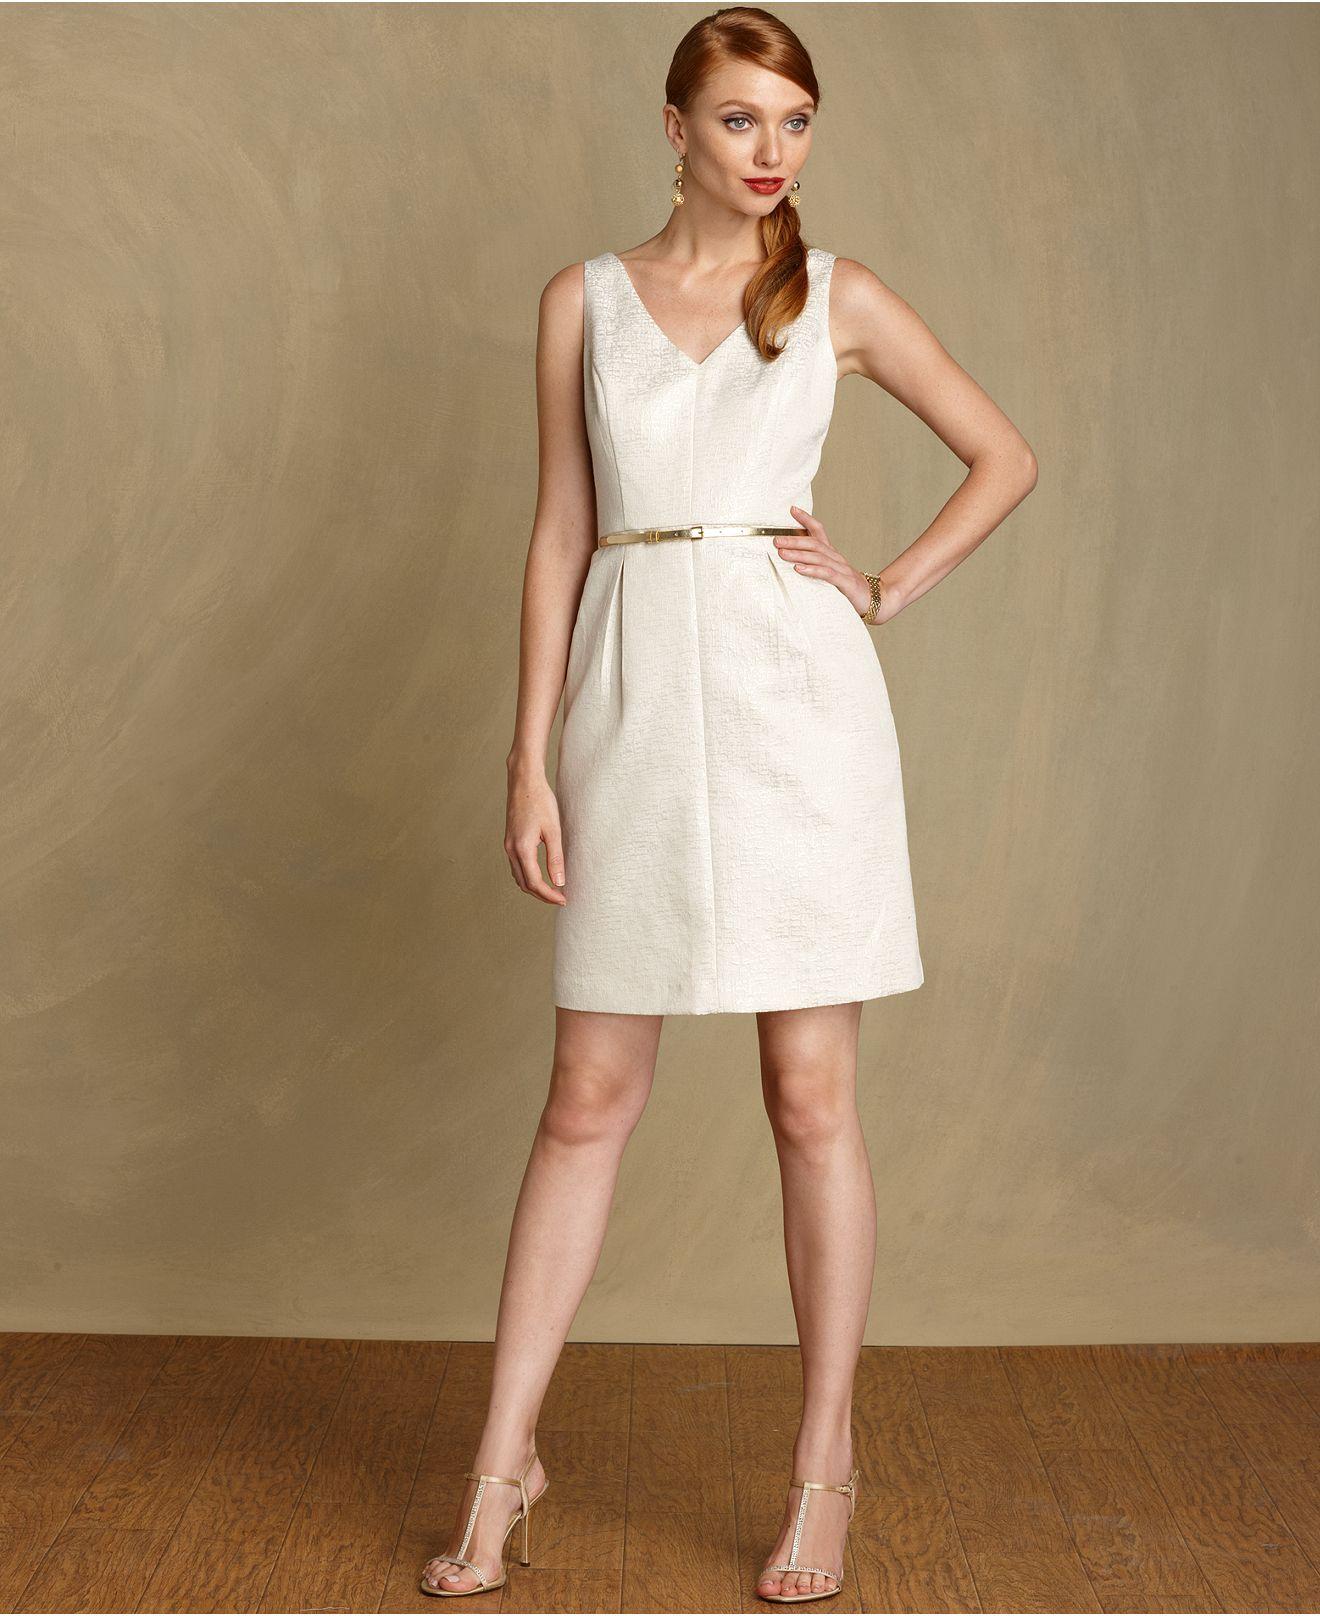 Macys womens dresses wedding  Tommy Hilfiger Dress VNeck Sleeveless Belted  Womens Dresses